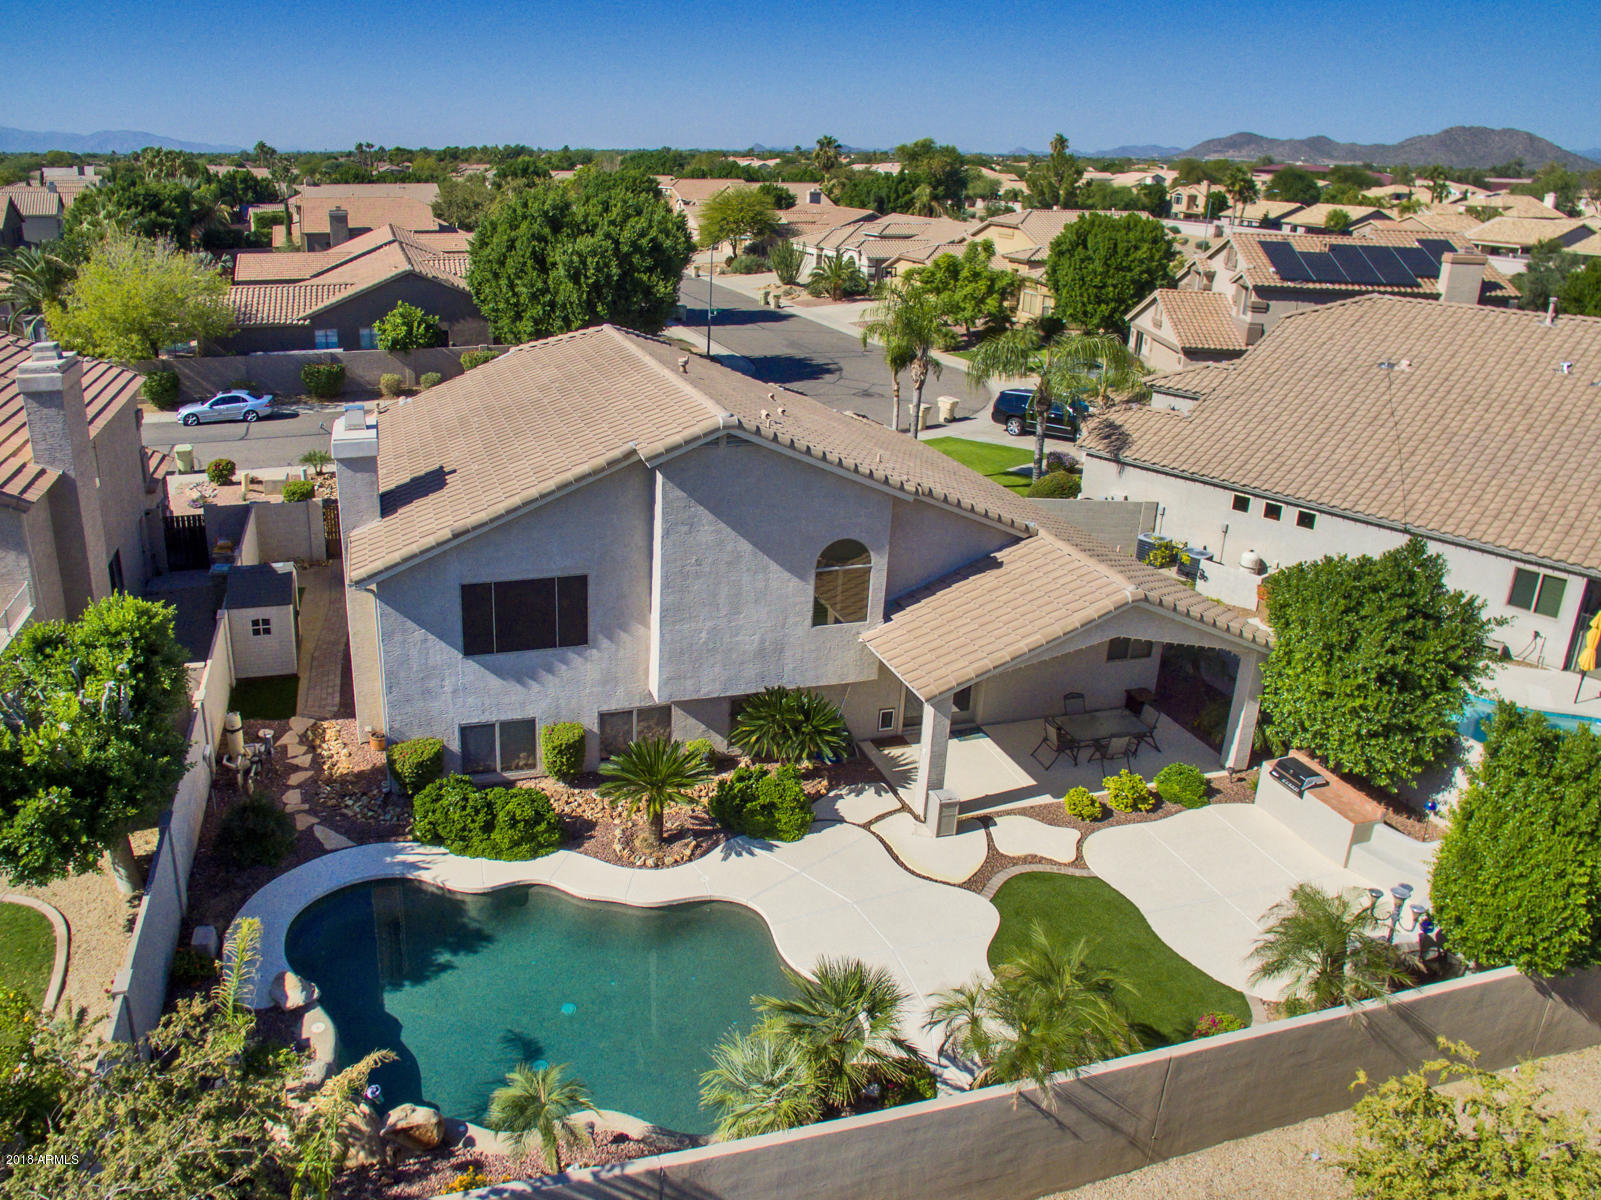 MLS 5844838 21517 N 69TH Drive, Glendale, AZ 85308 Glendale AZ Sierra Verde